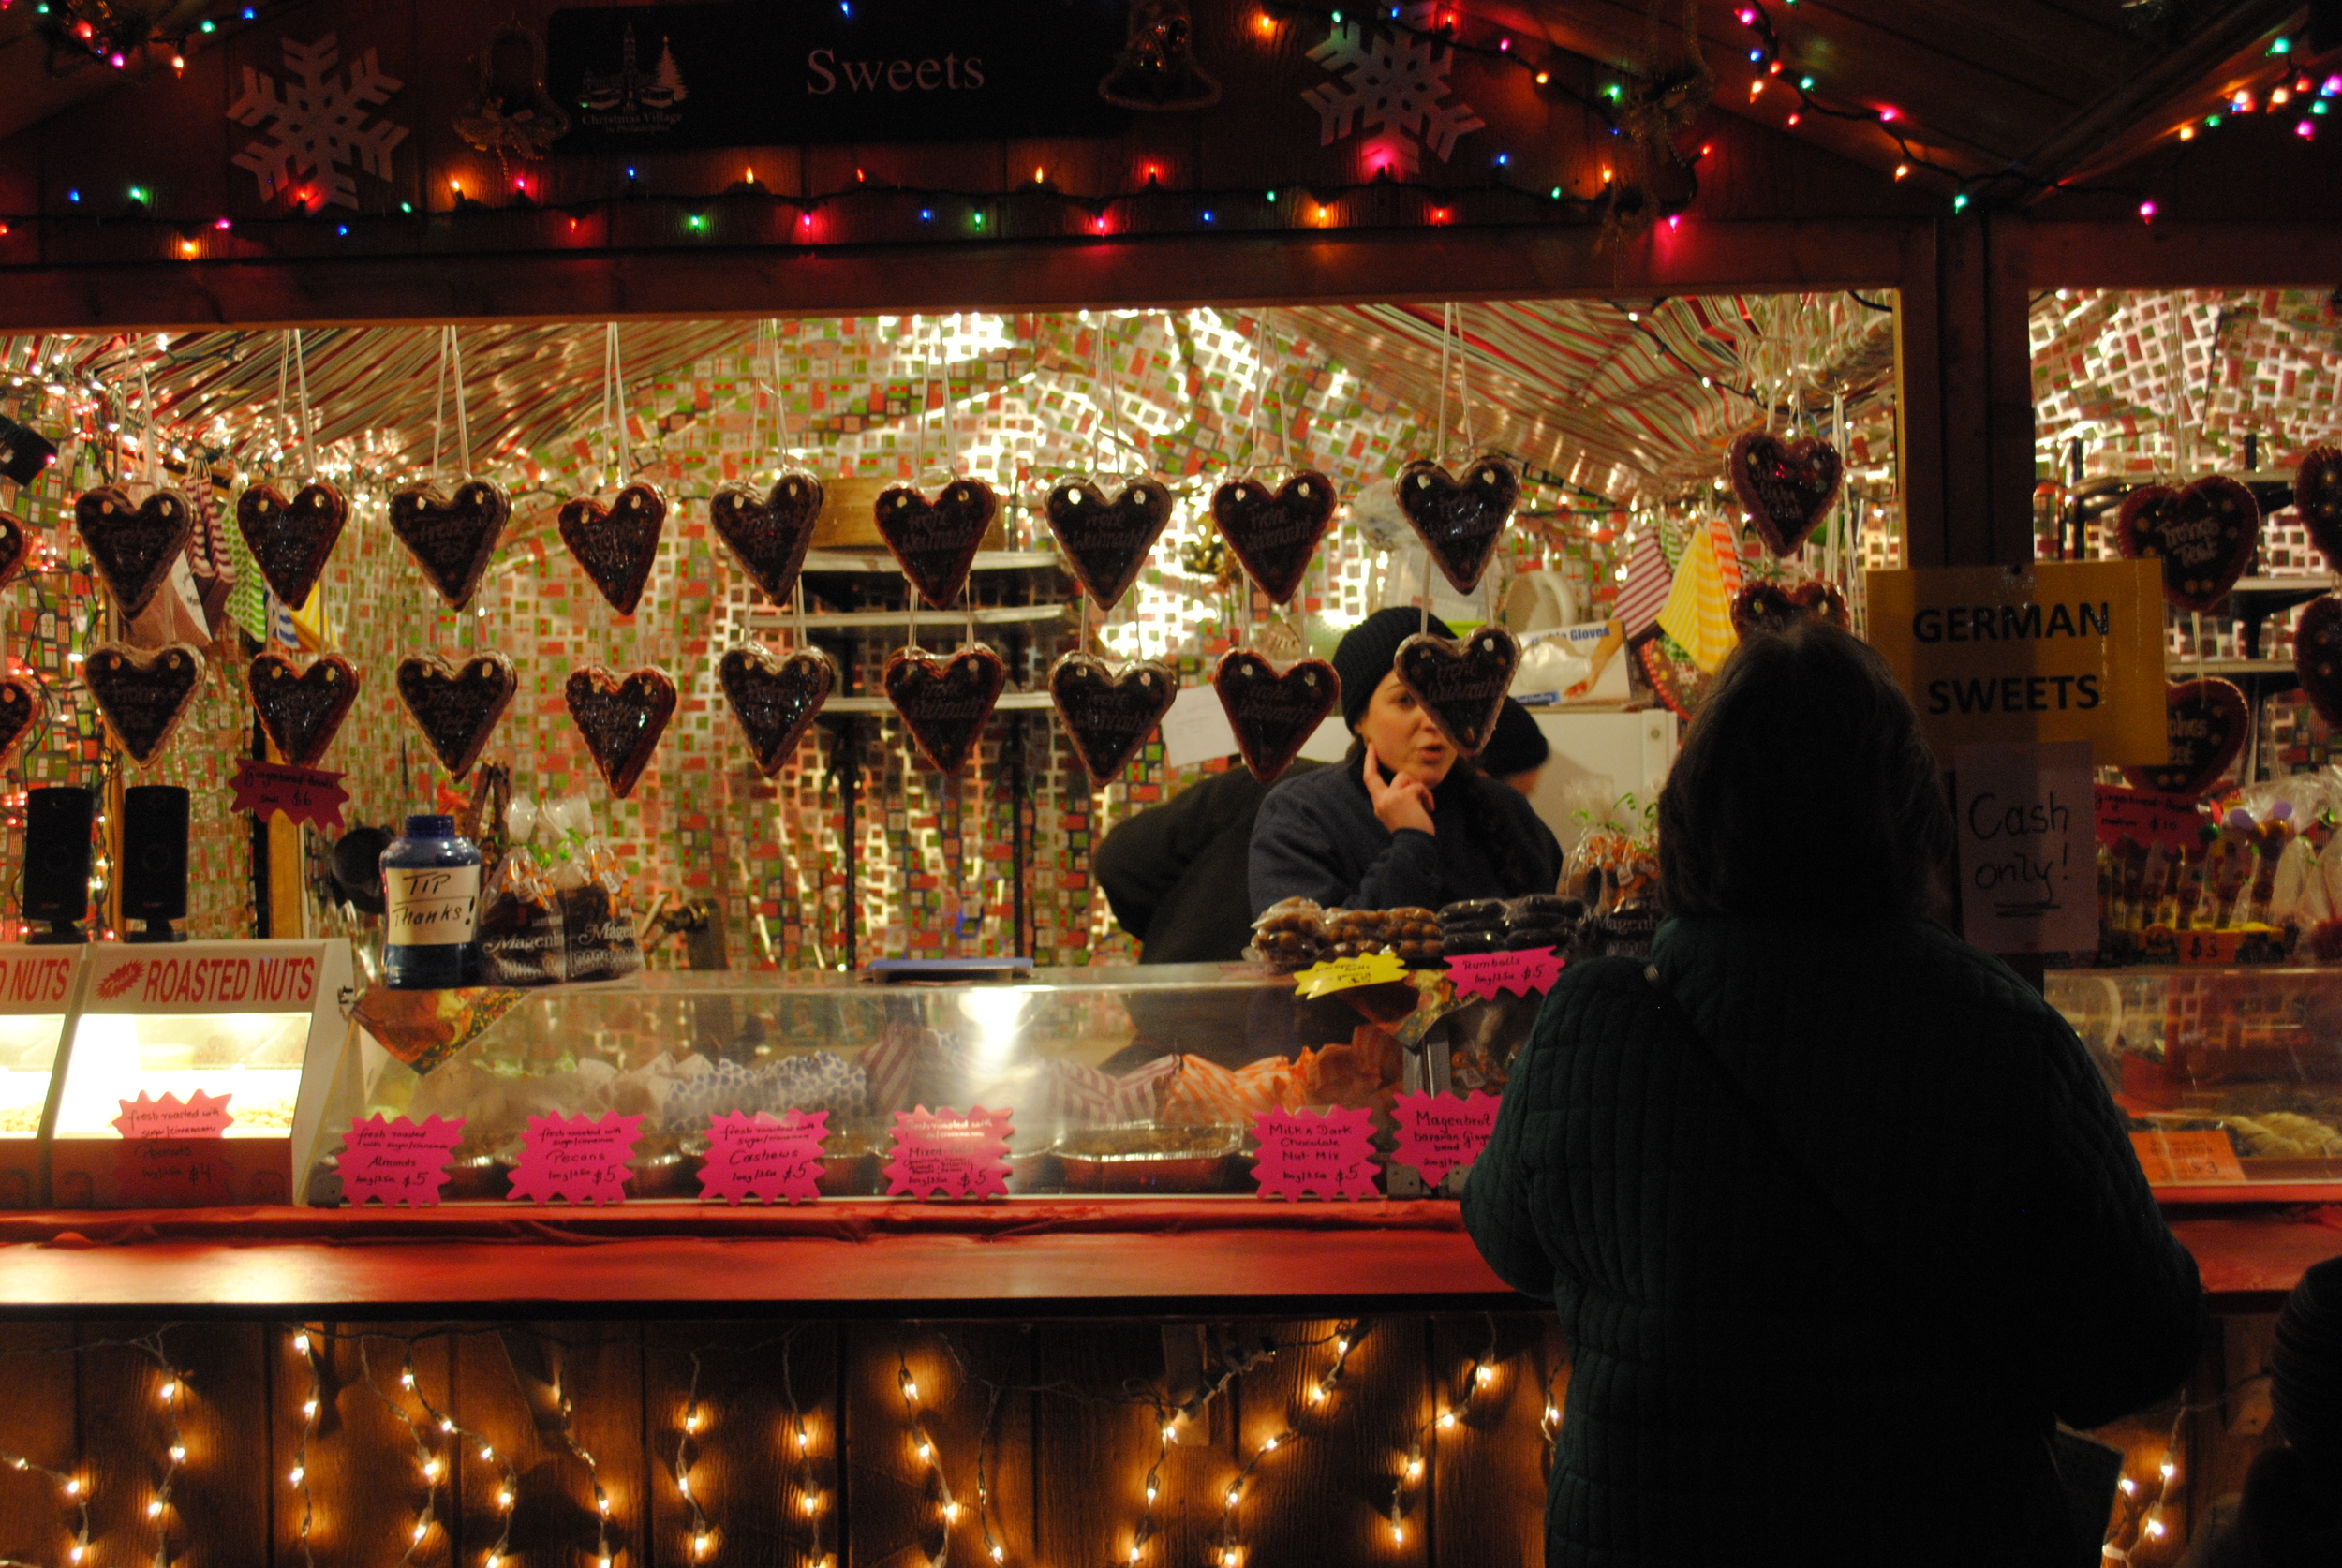 Christmas Village in Philadelphia, Love Park, Christmas Village, Christmas Market, German Market, Tourism, Holiday, Hospitality, Philly, Pennsylvania, Aversa PR